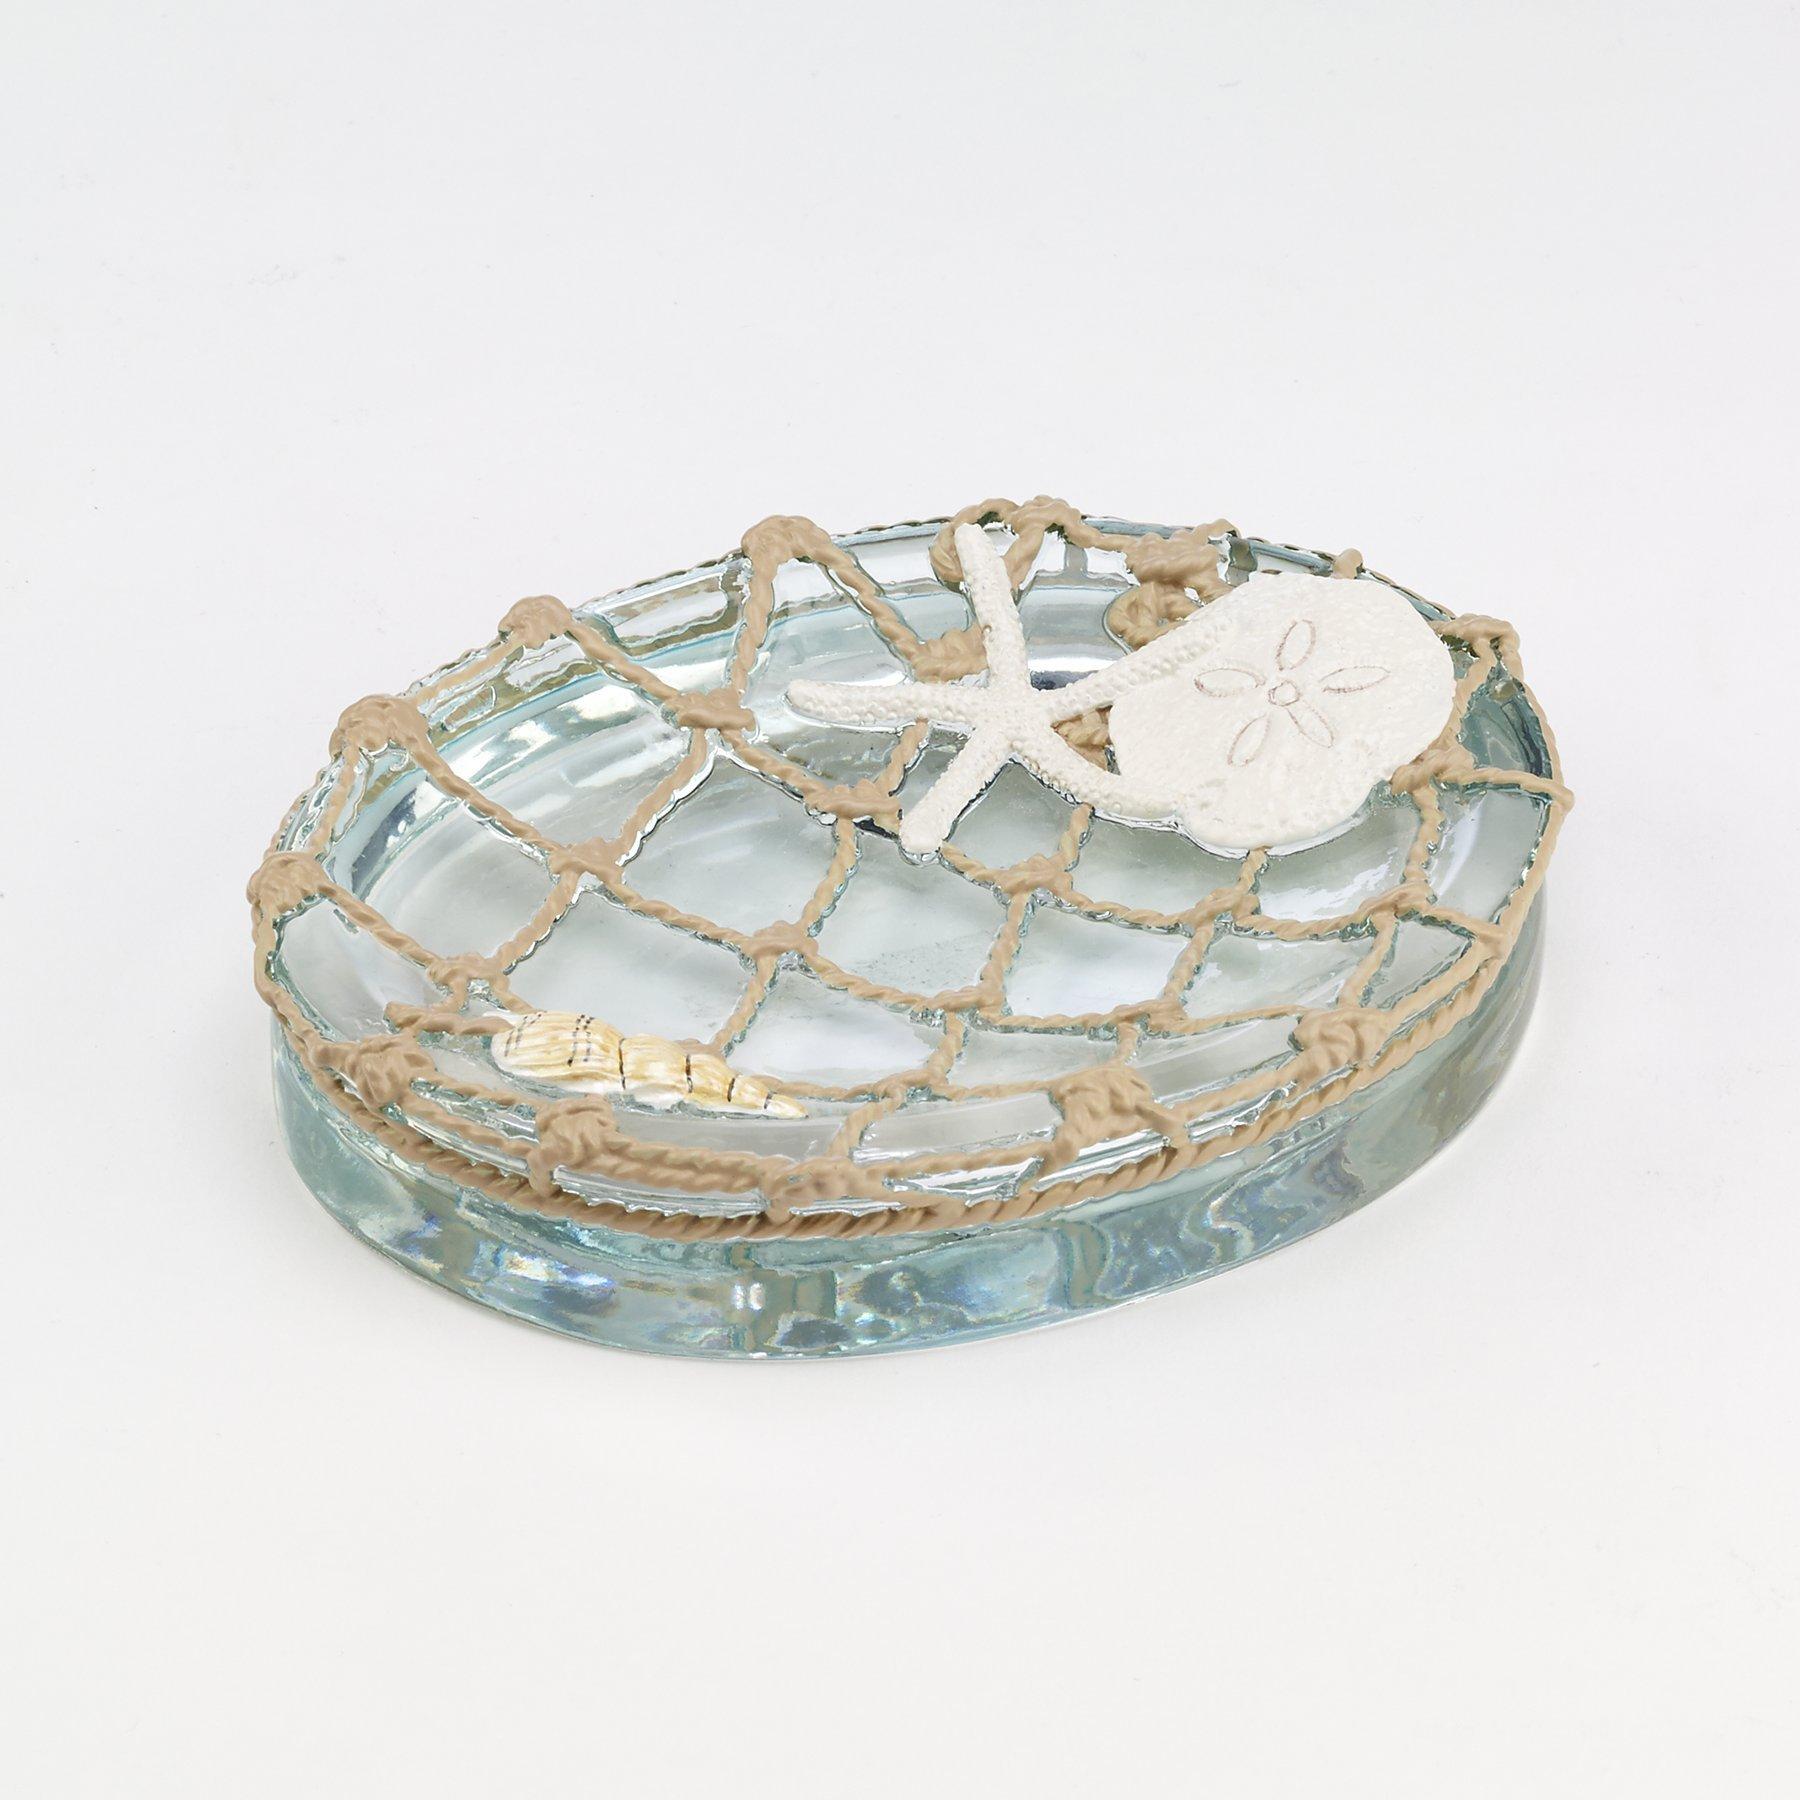 Avanti Linens Seaglass Soap Dish by Avanti Linens